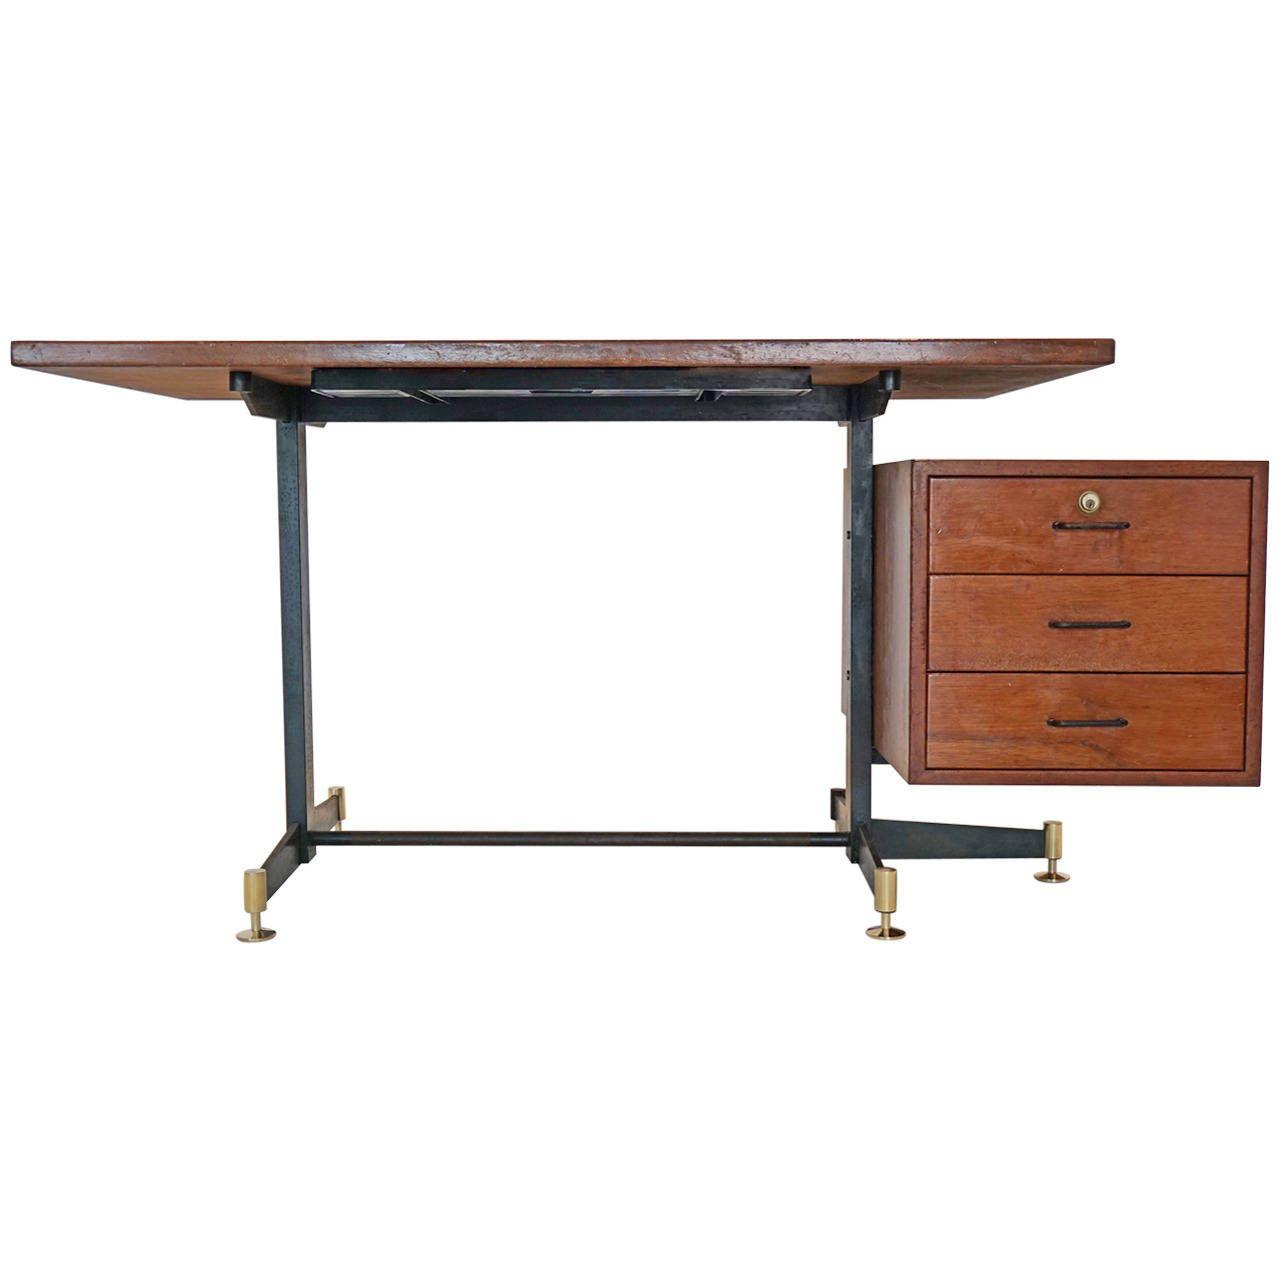 Osvaldo Borsani Desk   From a unique collection of antique and modern desks at https://www.1stdibs.com/furniture/storage-case-pieces/desks/